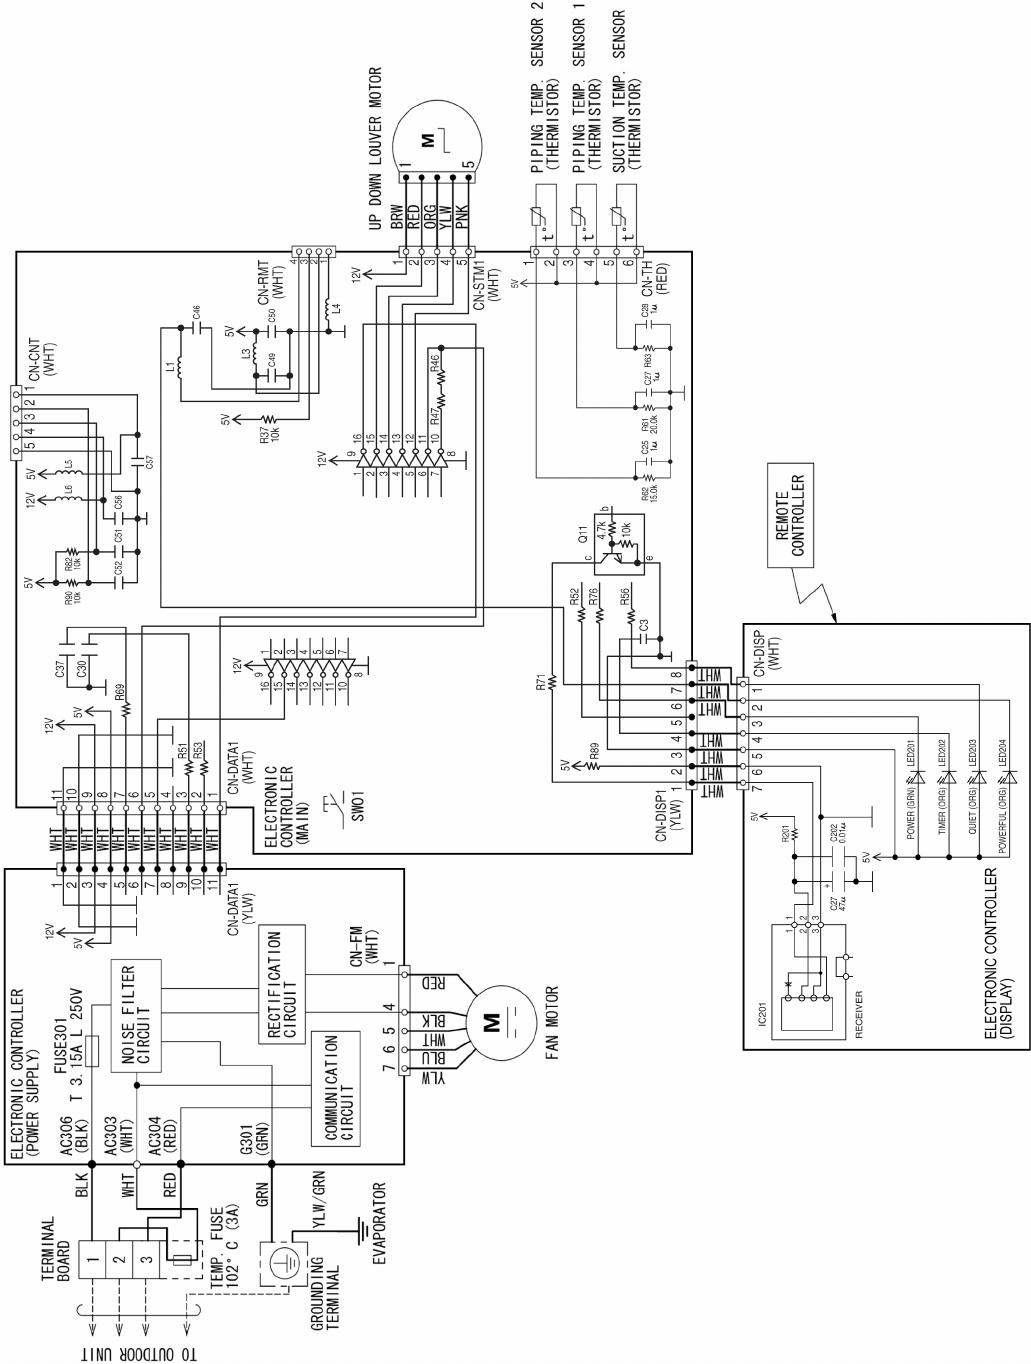 Panasonic Cs E12nkuaw E9nkuaw Cu E12nkua E9nkua Page 16 Powercontrollercircuitdiagram5png Search